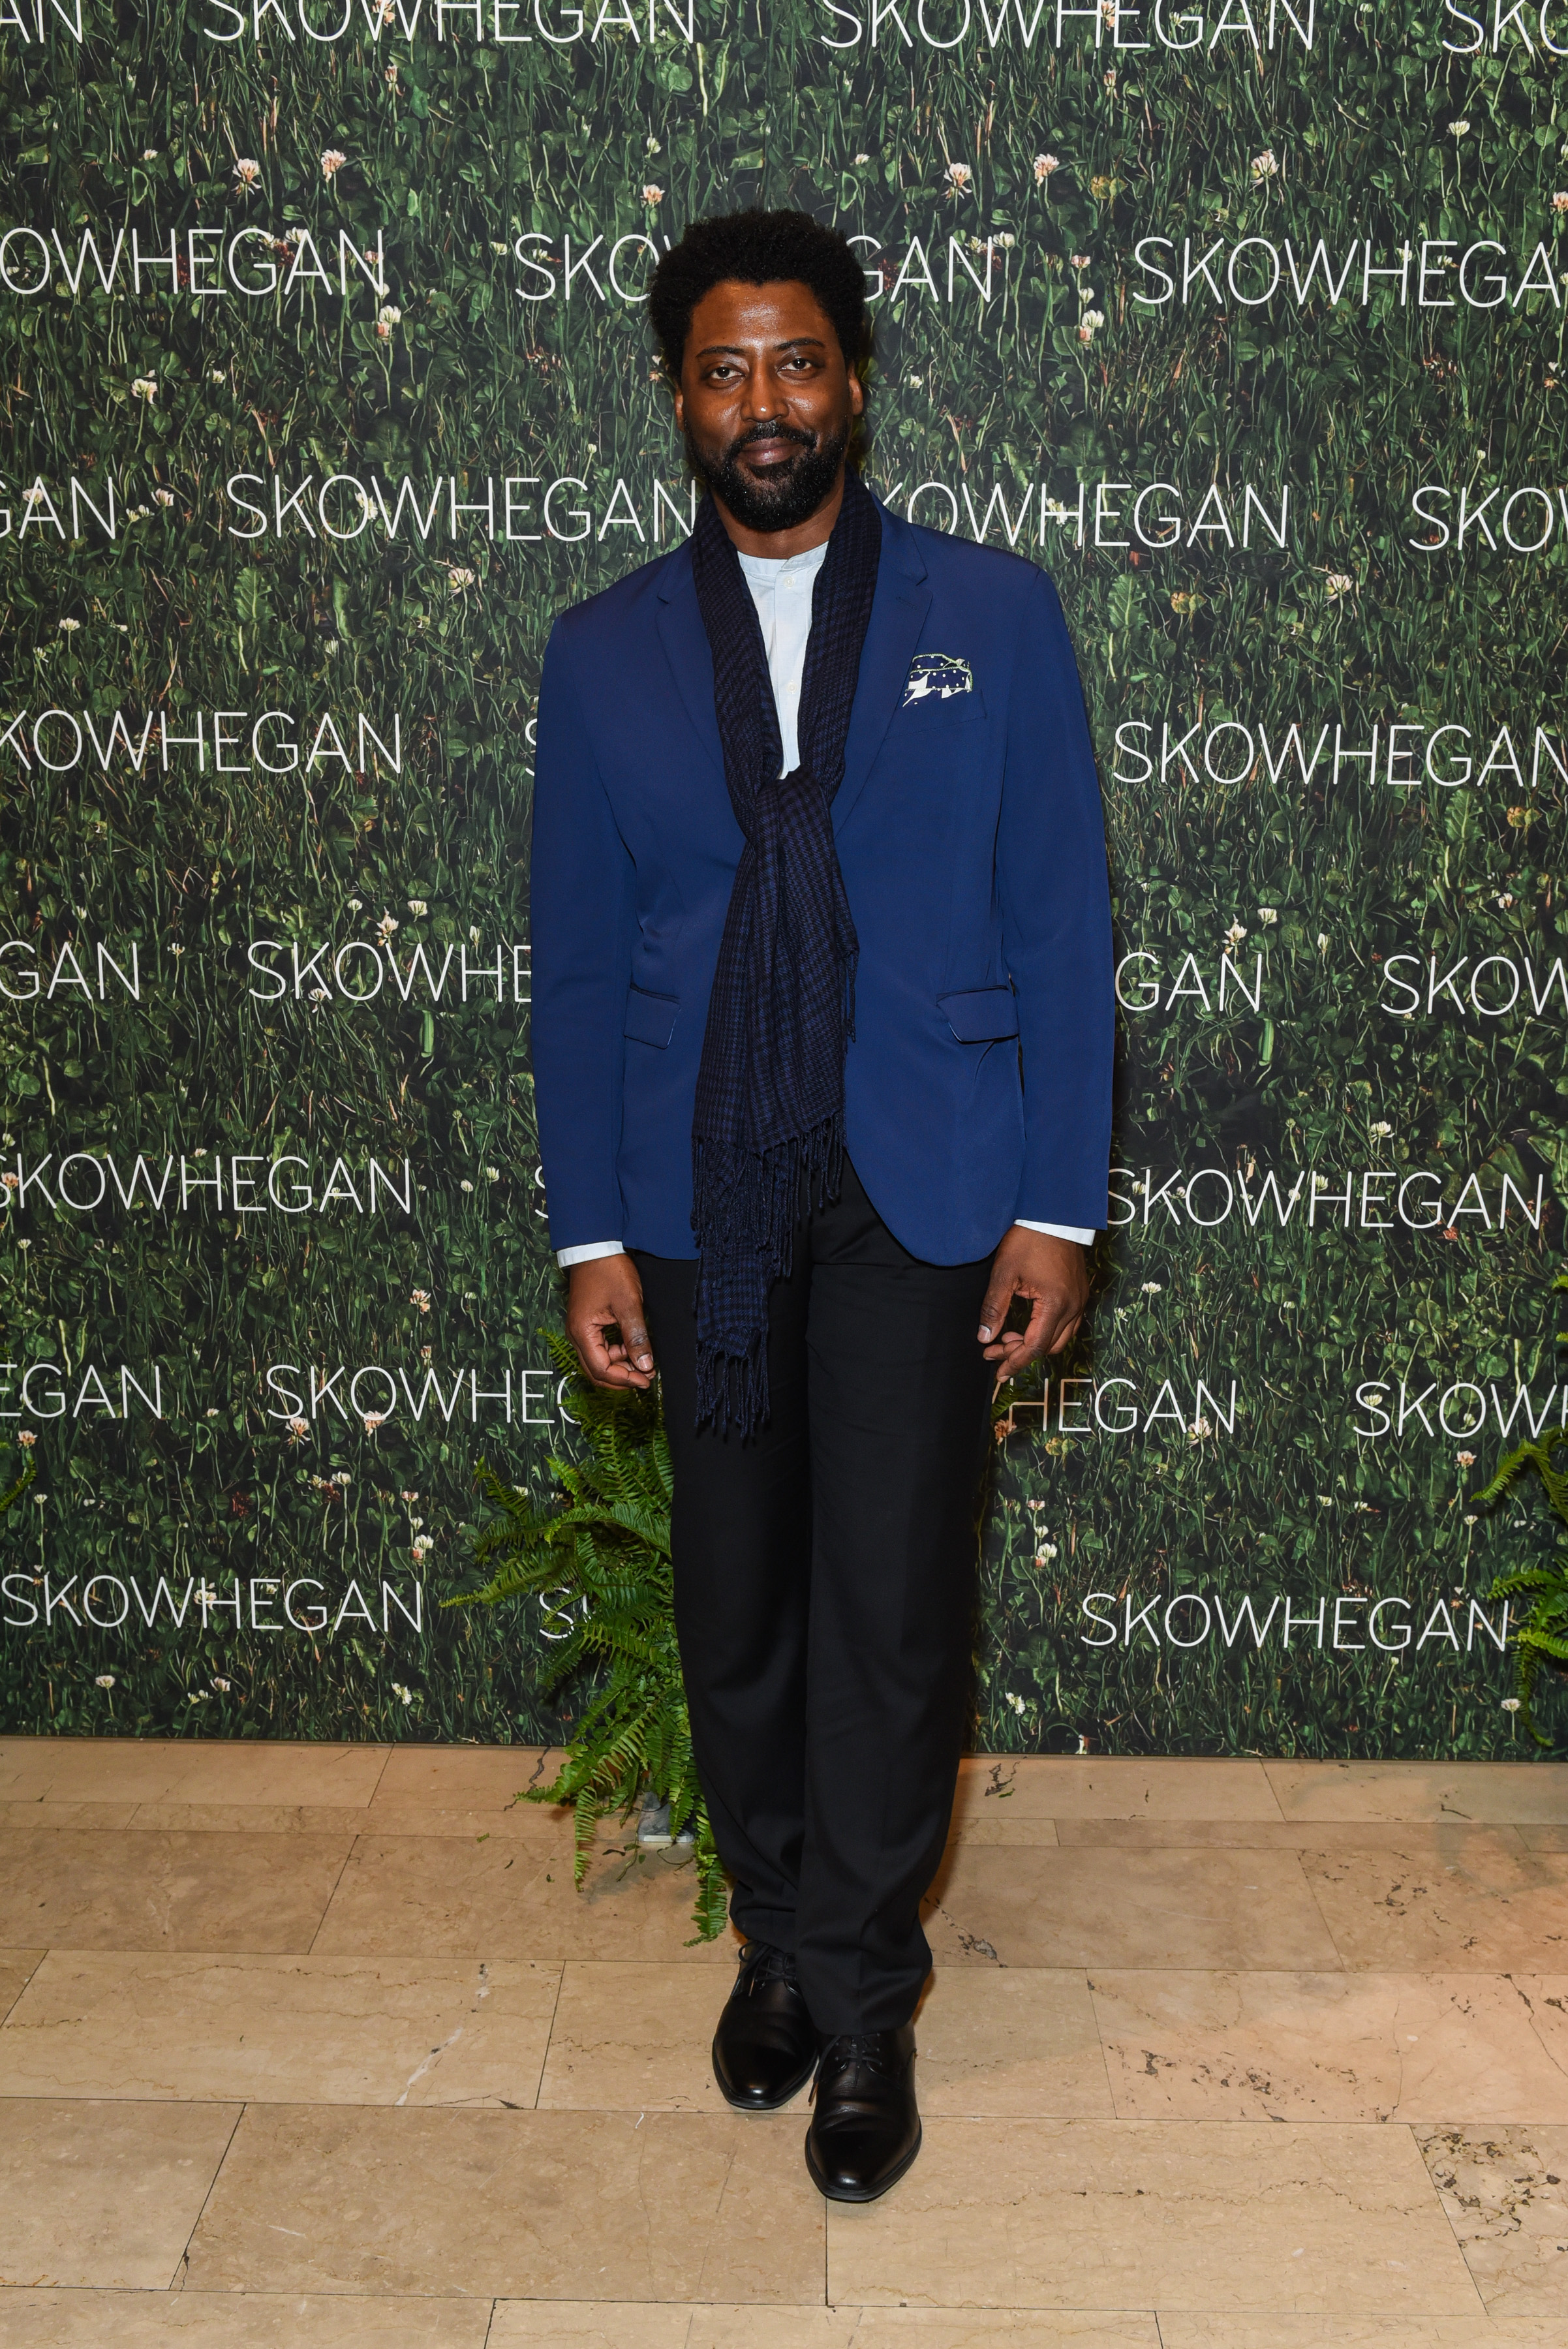 LeRonn Brooks==Skowhegan Awards Dinner 2018==The Plaza Hotel, New York, NY==April 24, 2018==�Patrick McMullan==Photo - Presley Ann/PMC====